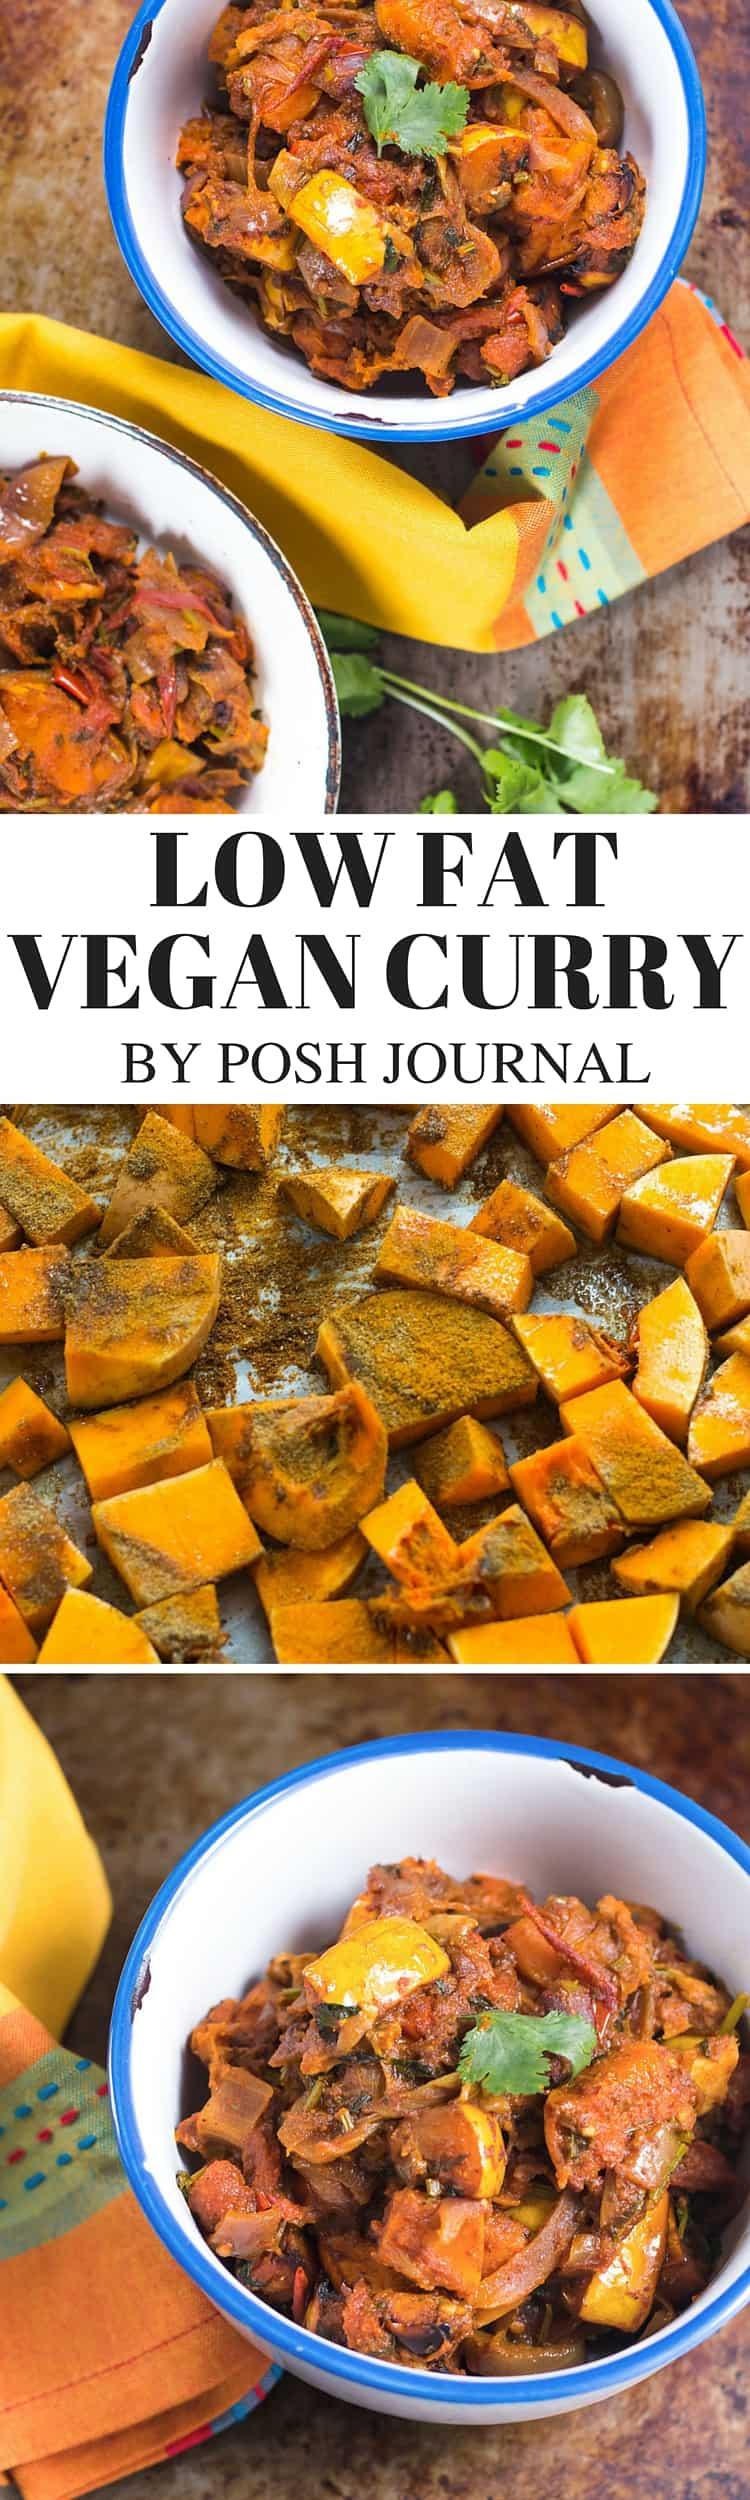 low fat vegan curry